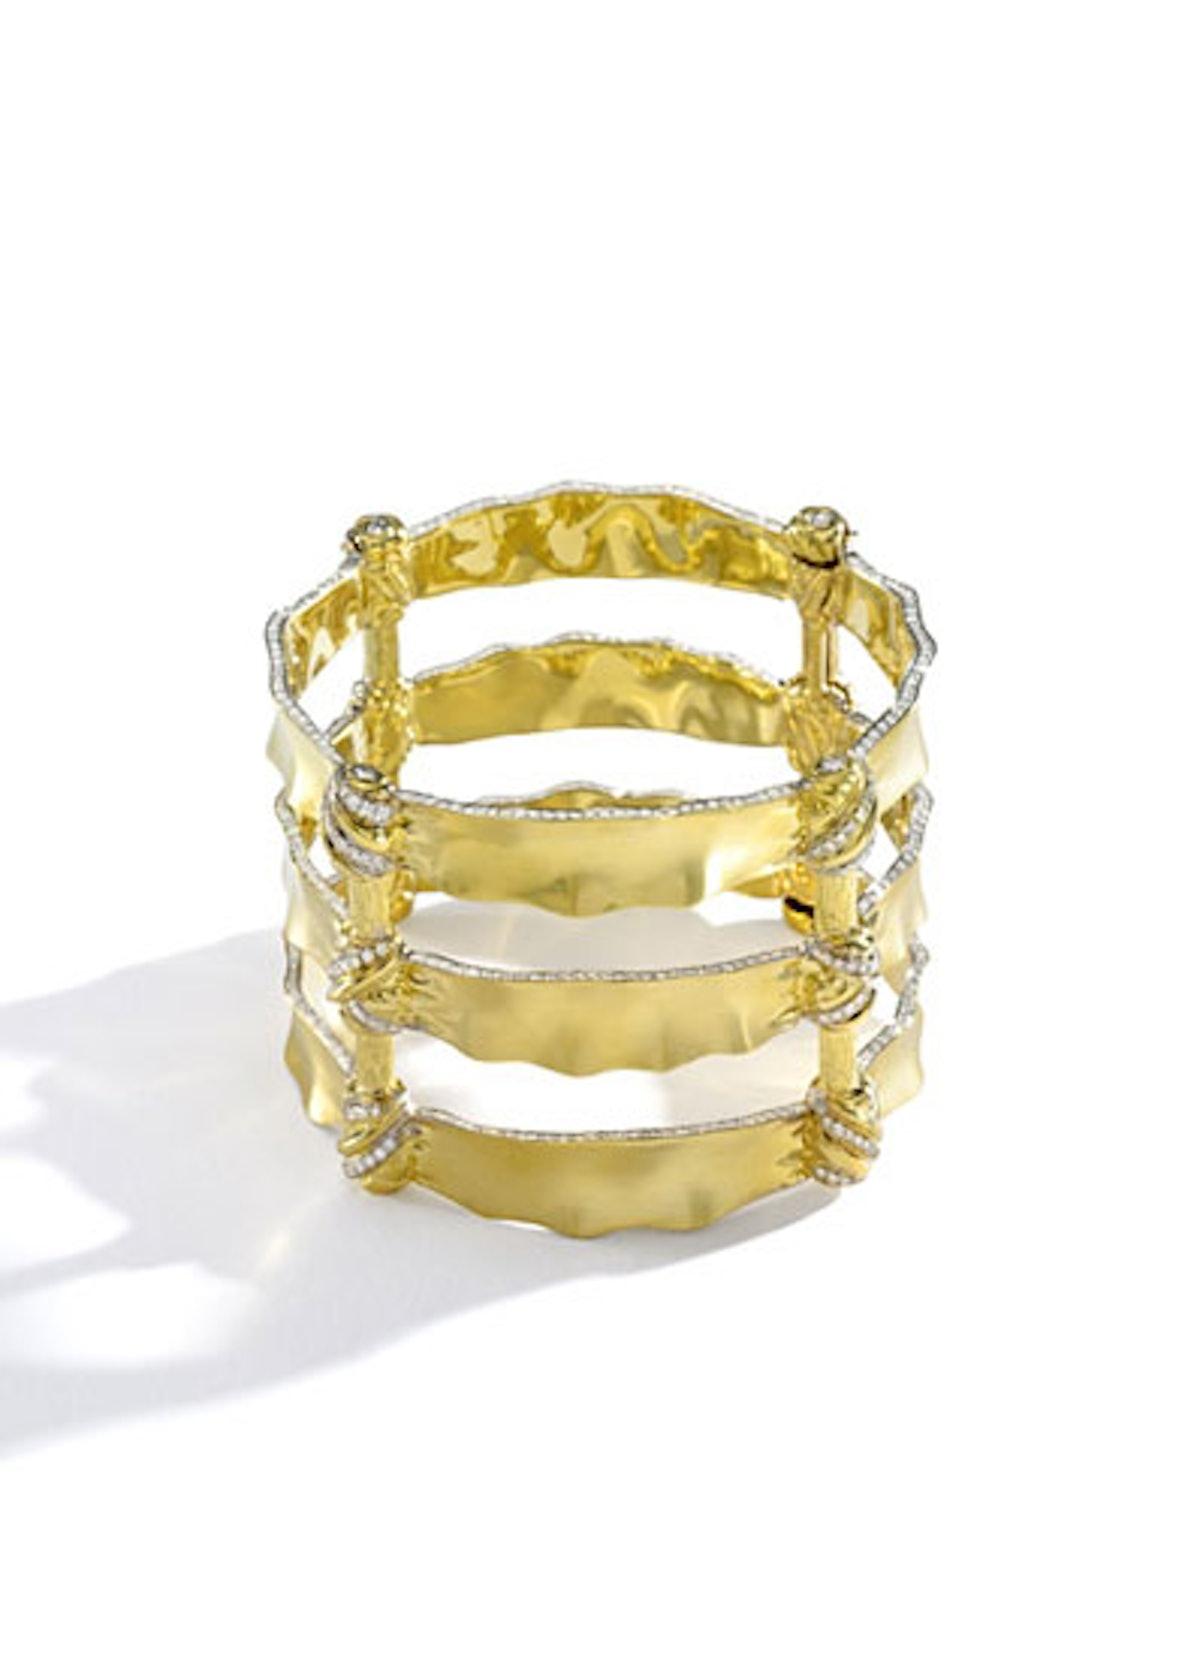 fass-gold-fashion-trend-09-v.jpg